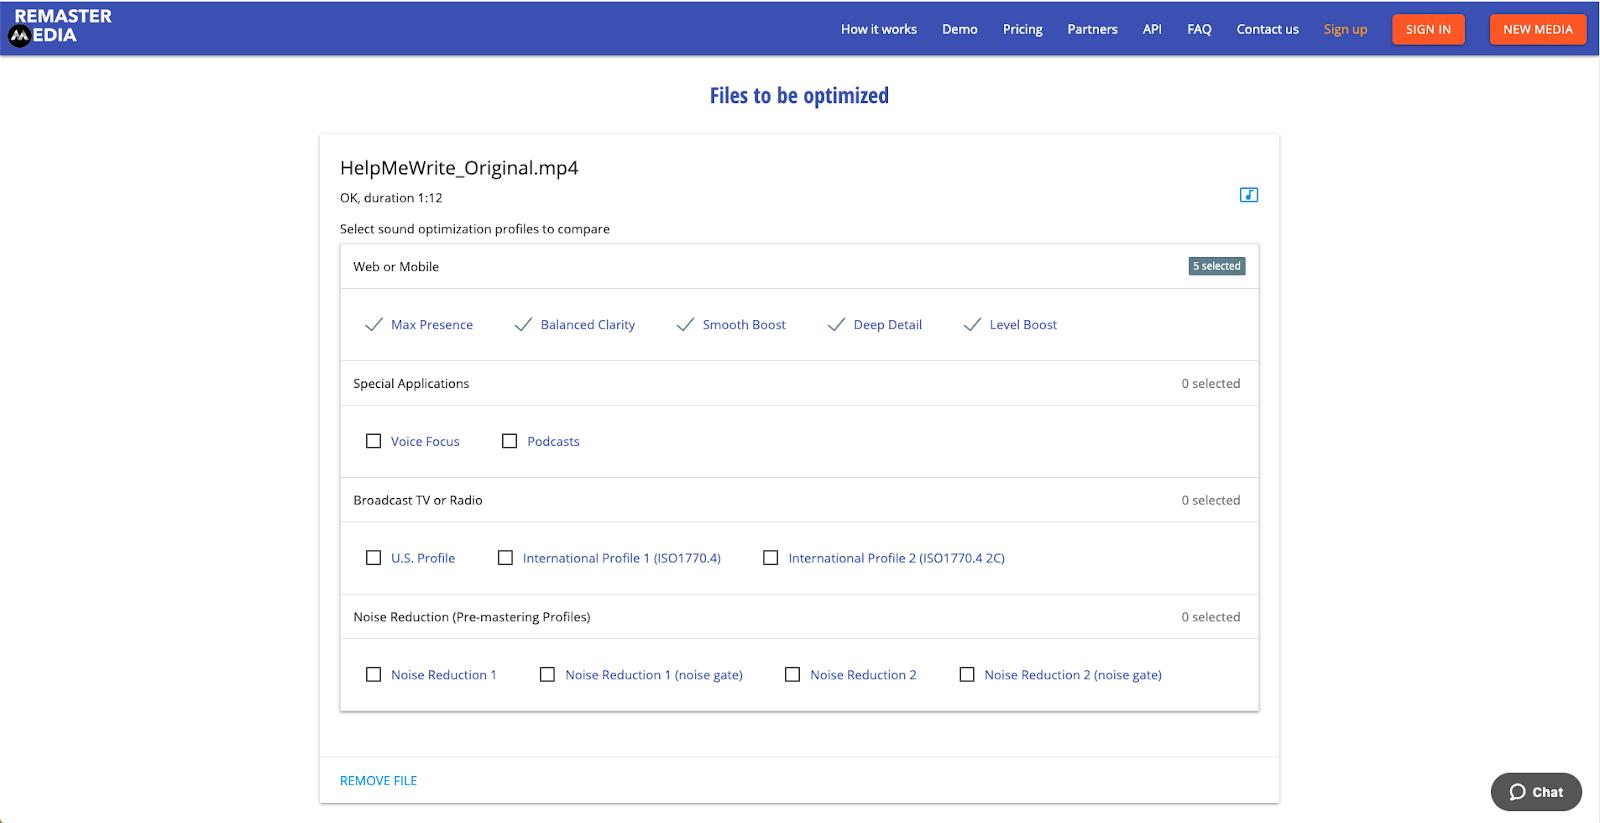 File Optimized- ReMasterMedia